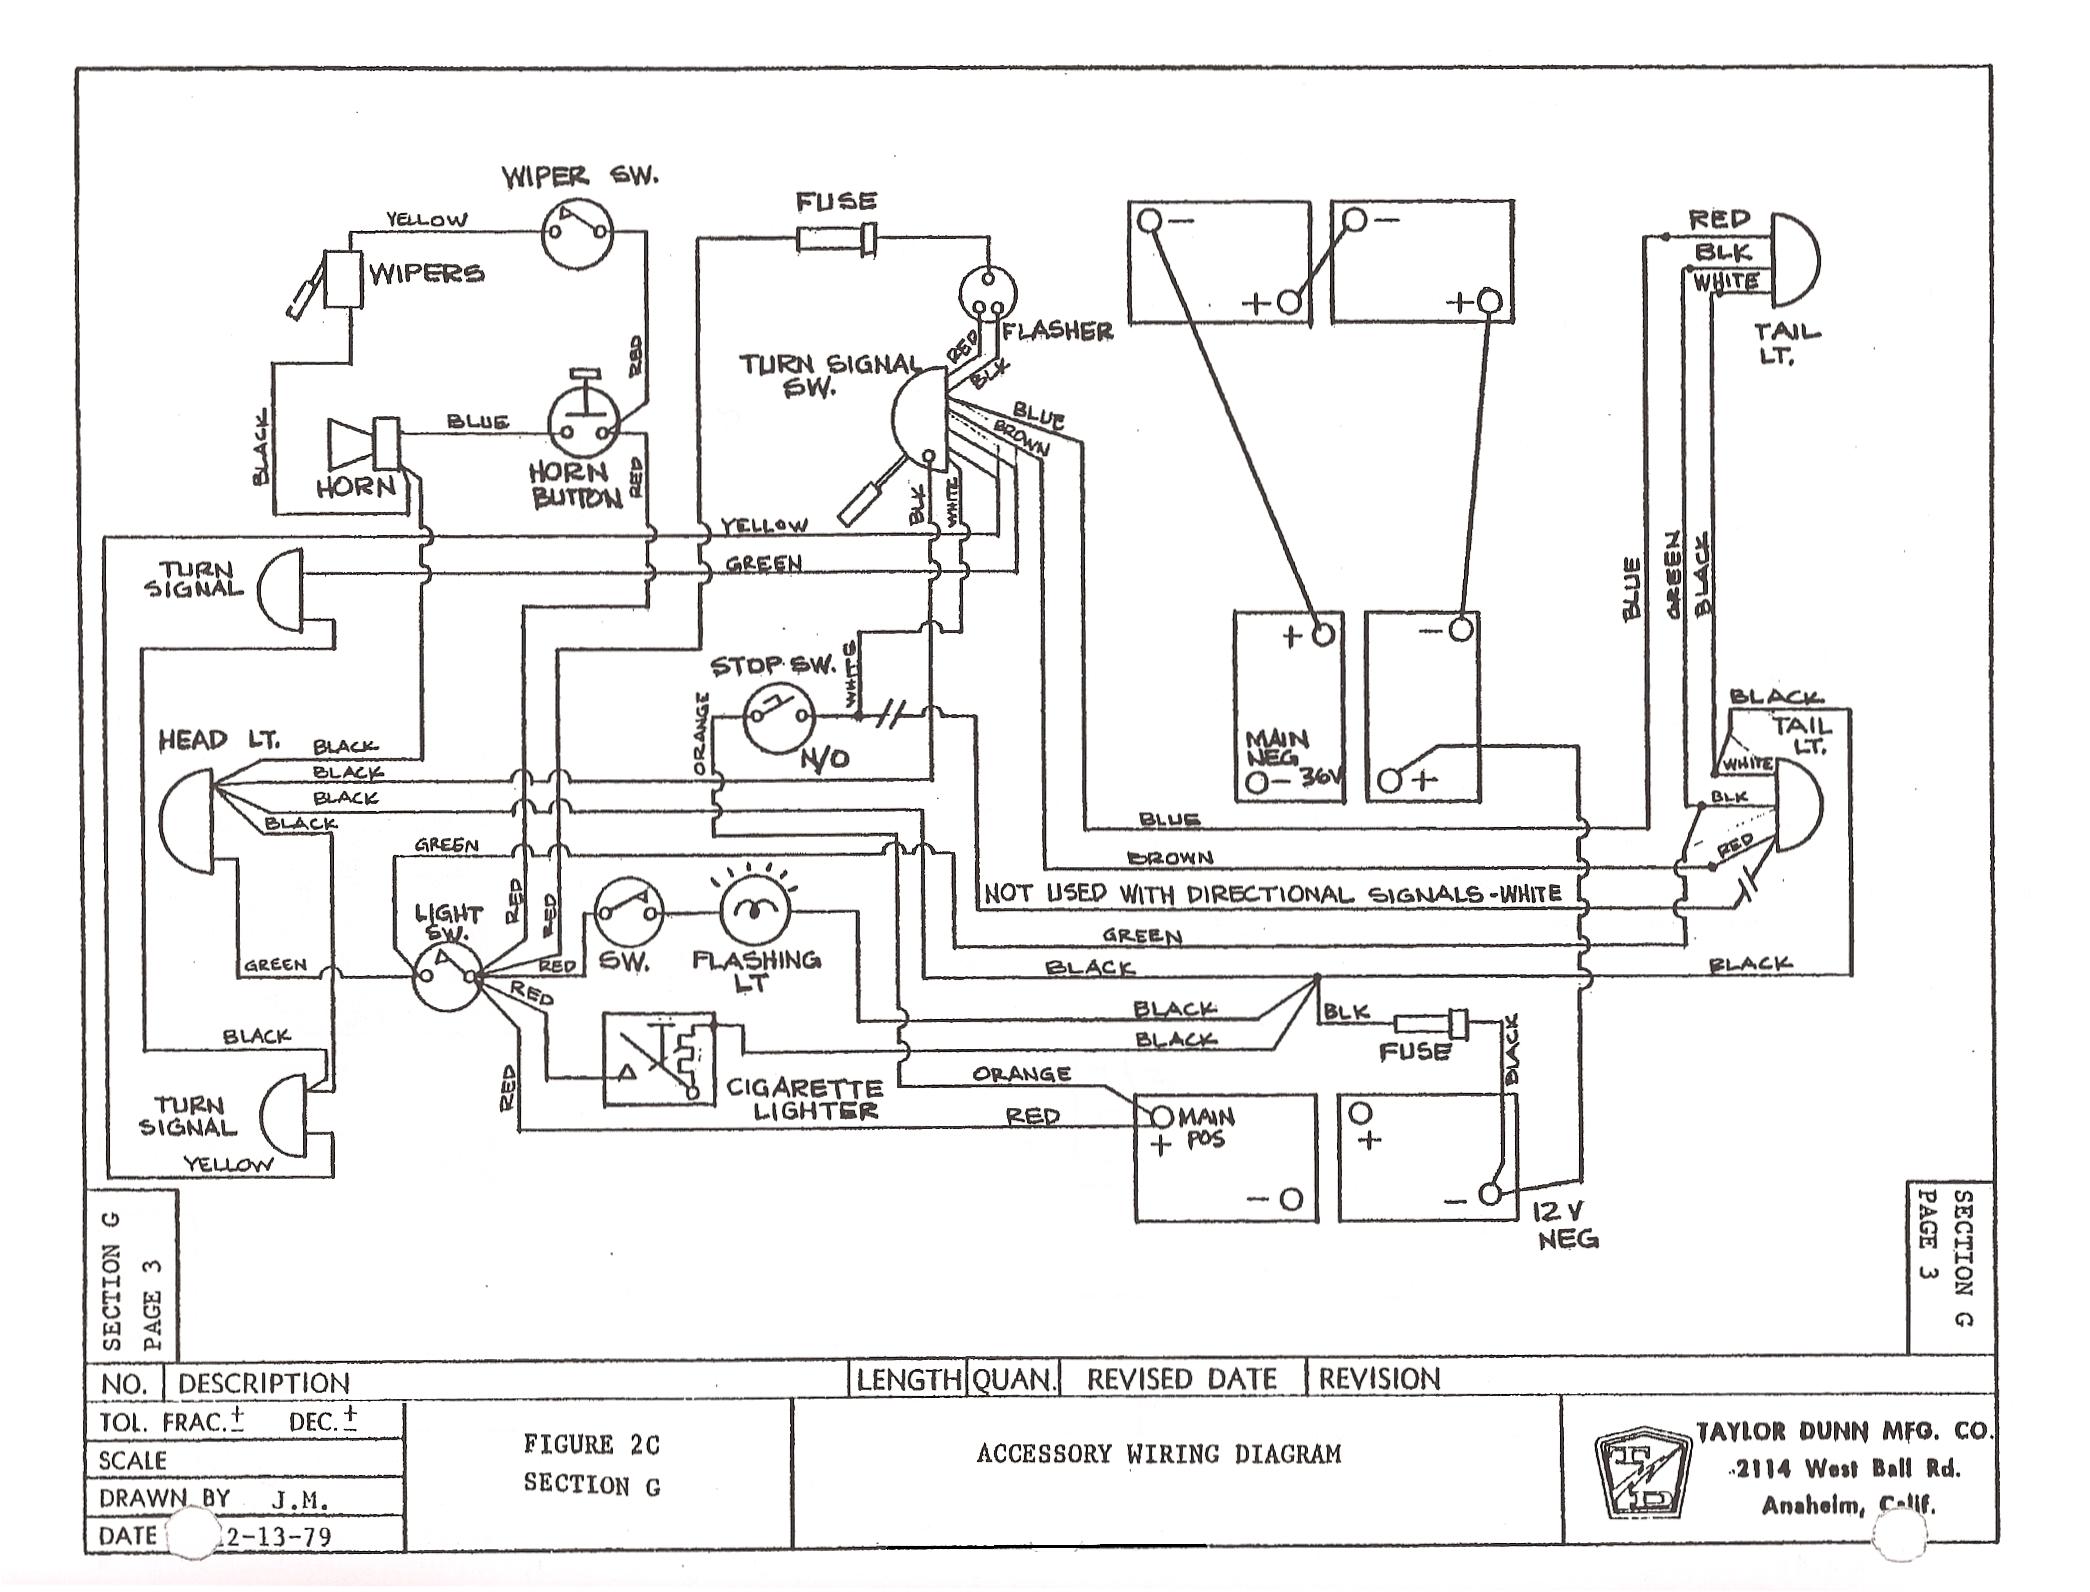 1989 ezgo marathon wiring diagram resistor wiring library 1989 electric ezgo electric marathon resistor wiring diagrams